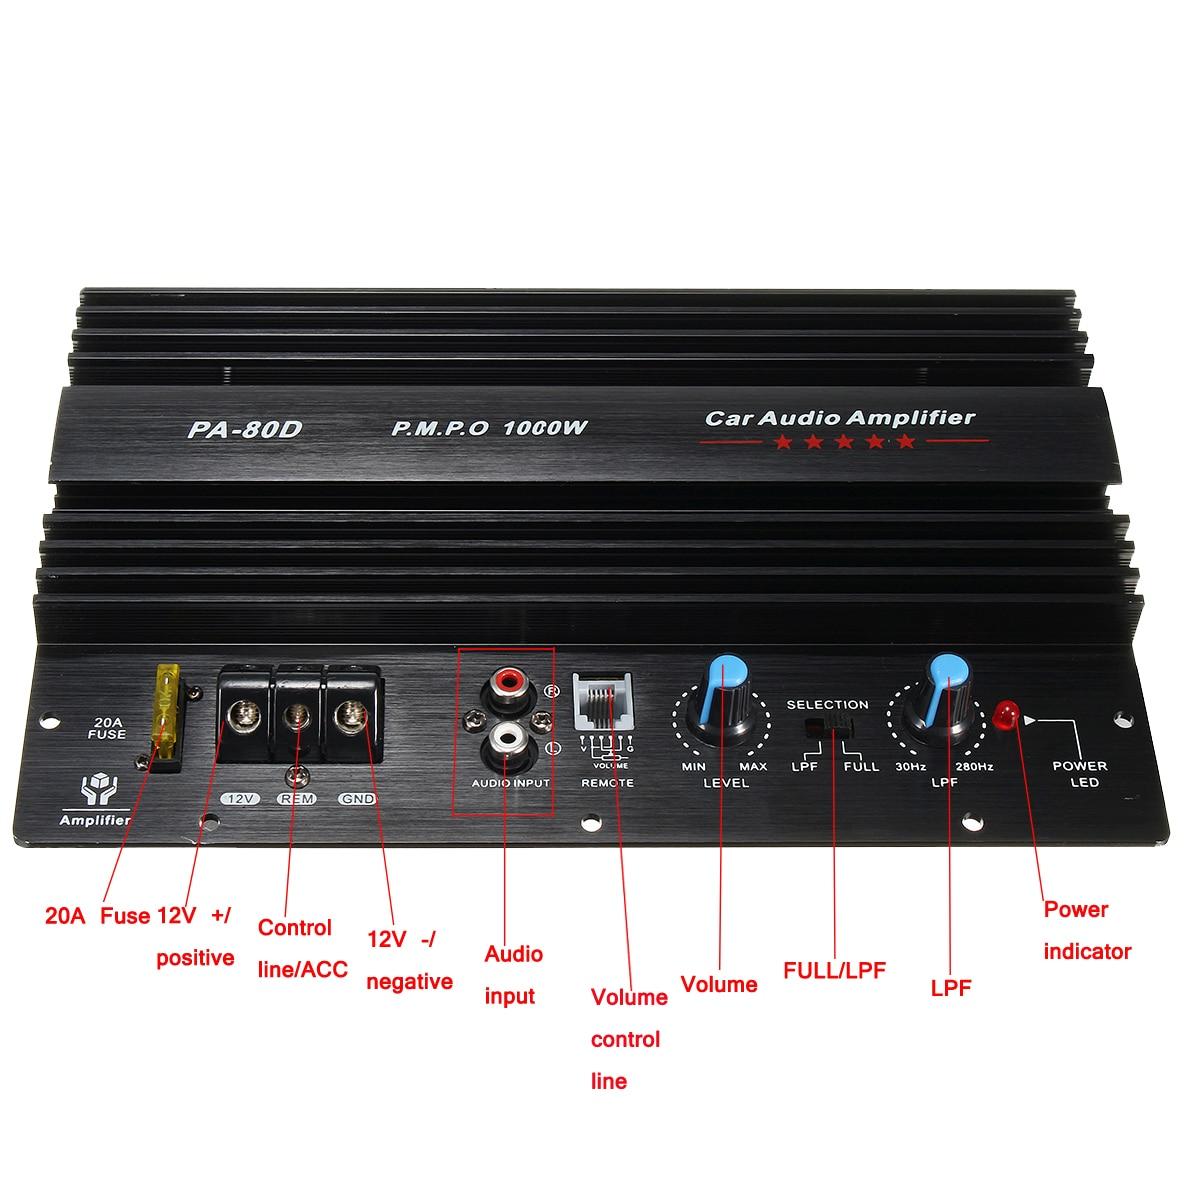 Dc12v Audio 1000w Amplifier Circuit Diagrams Electrical Wiring Circuitsaudio Diagram Kroak 12v Car Subwoofers Board Mono Inverter